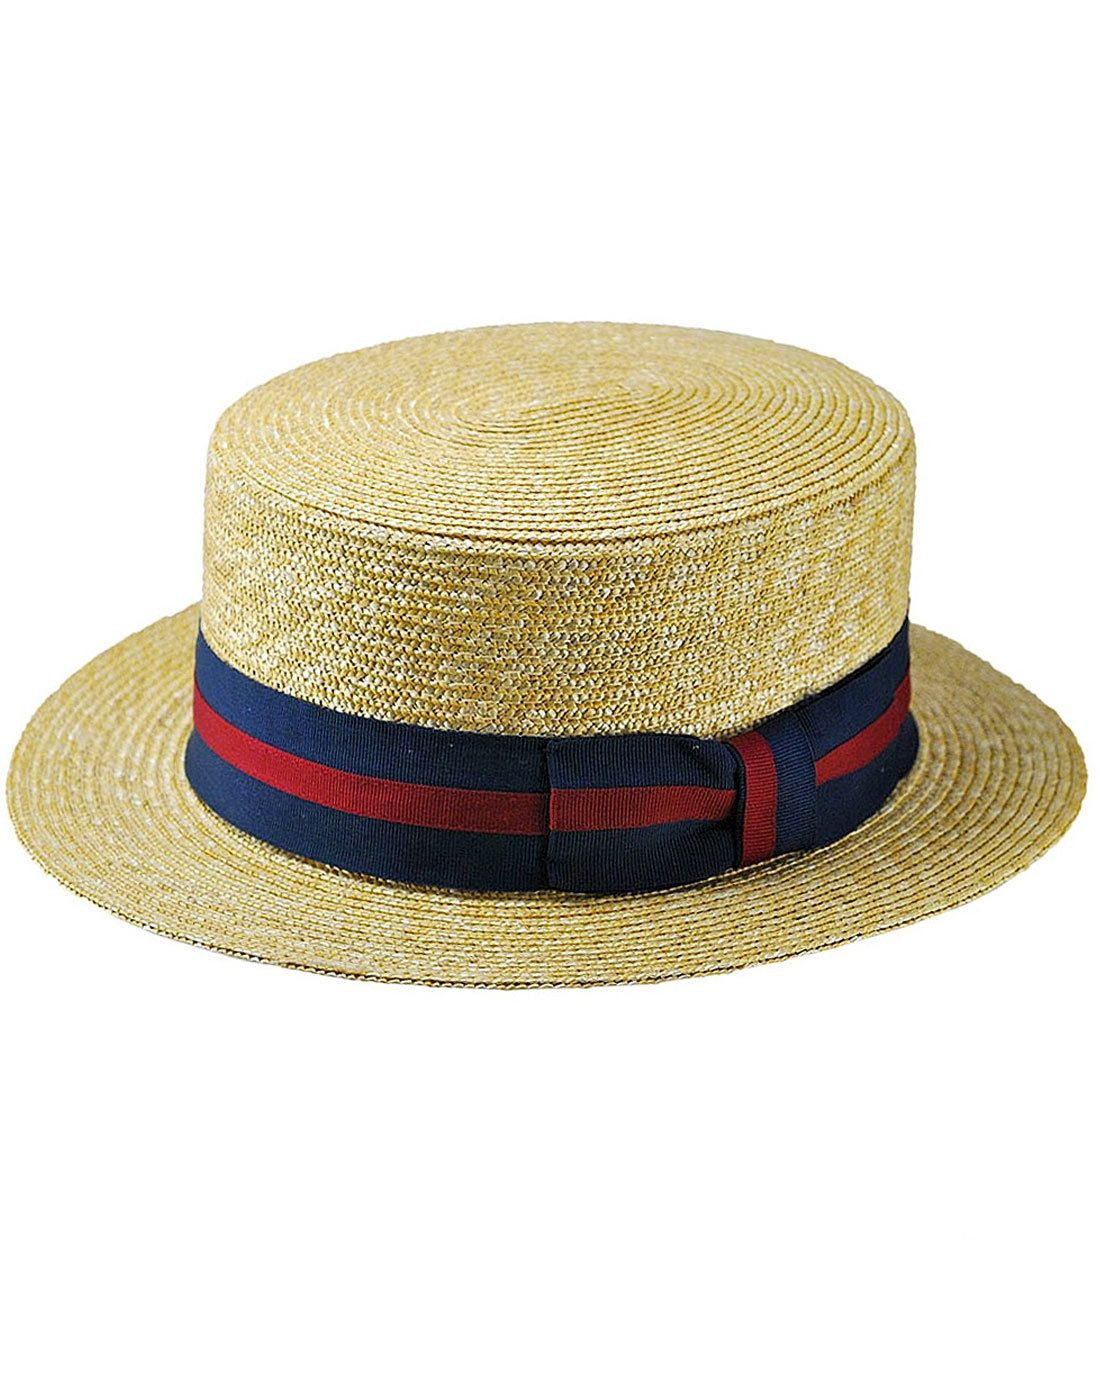 Failsworth men s retro Oxford straw boater hat. - Flat crown and straight  brim. - Classic straw 8dd185b63e3